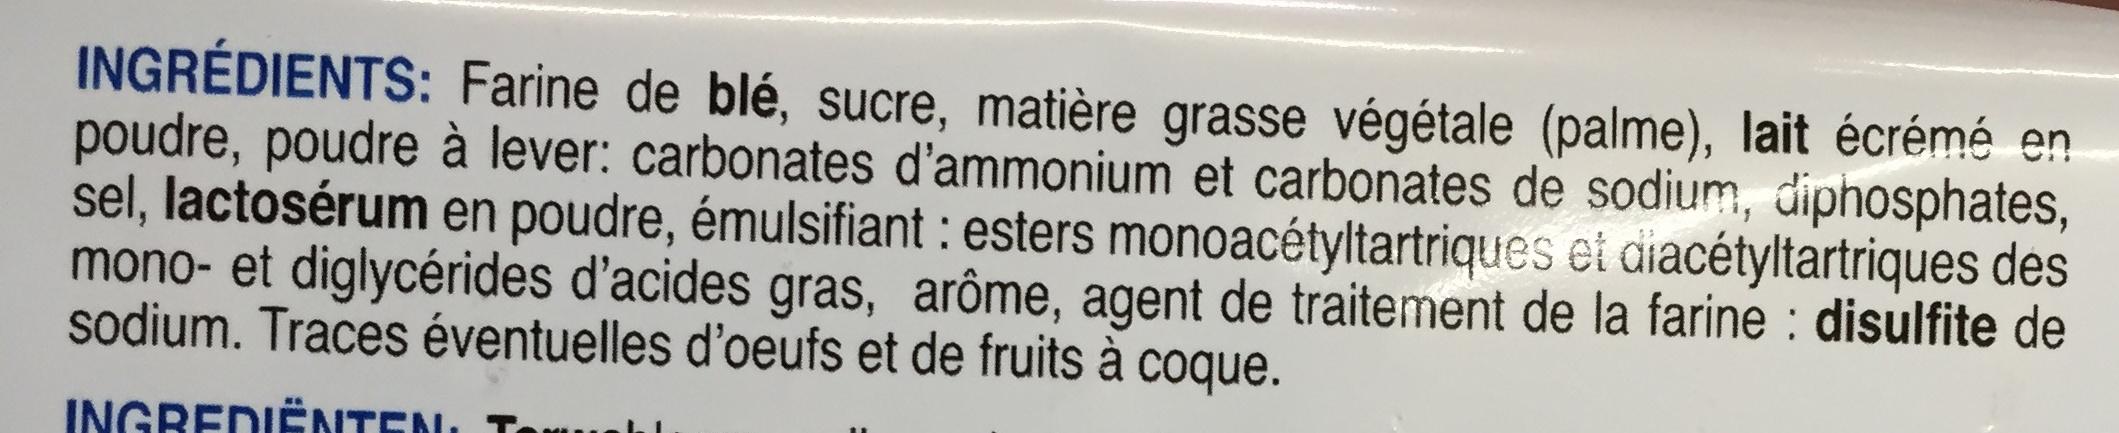 Goûters secs - Ingrediënten - fr